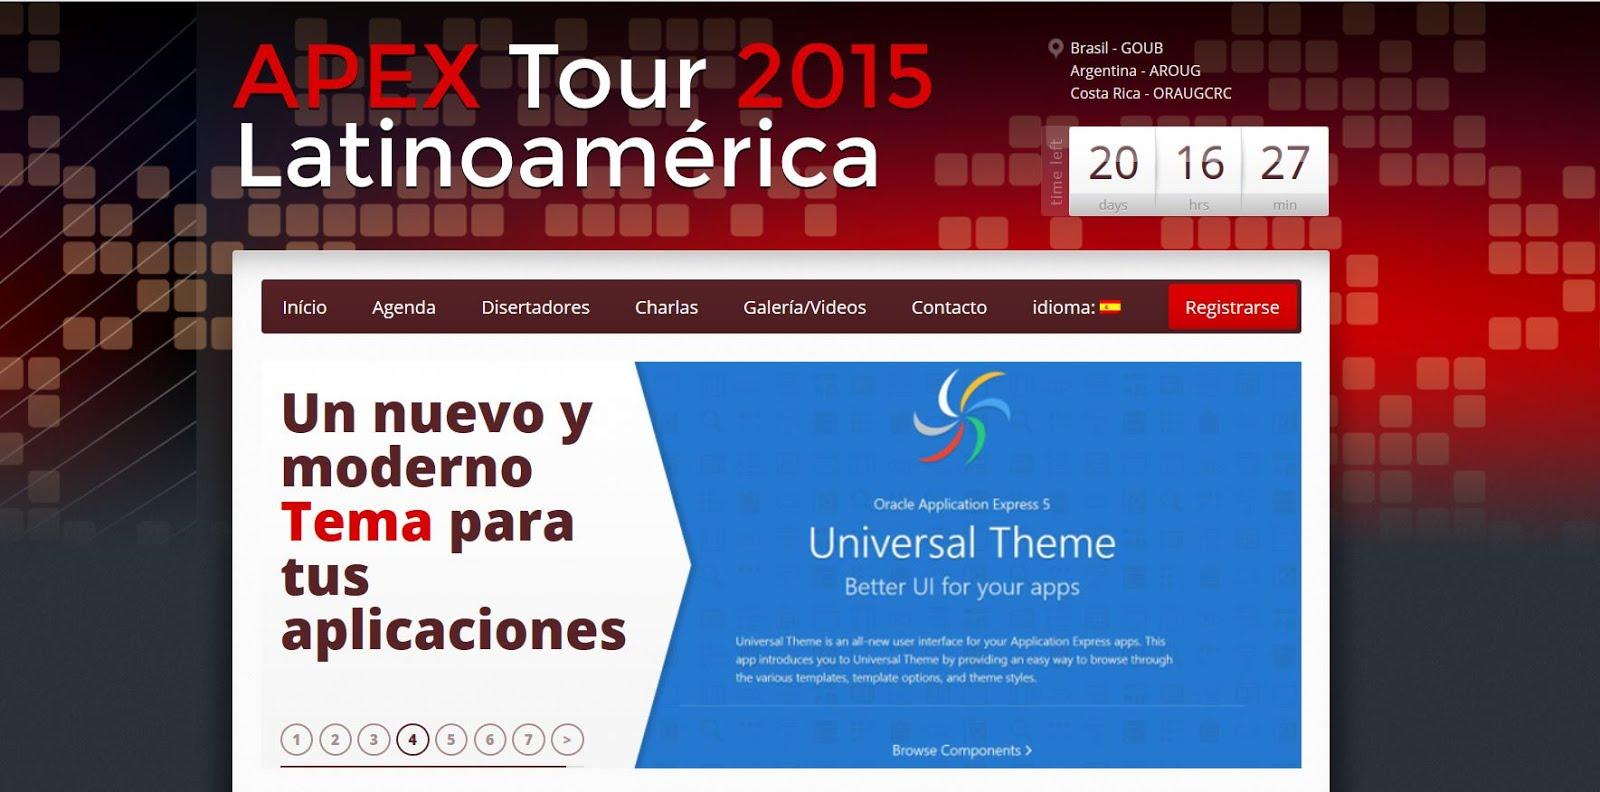 Apex Tour 2015